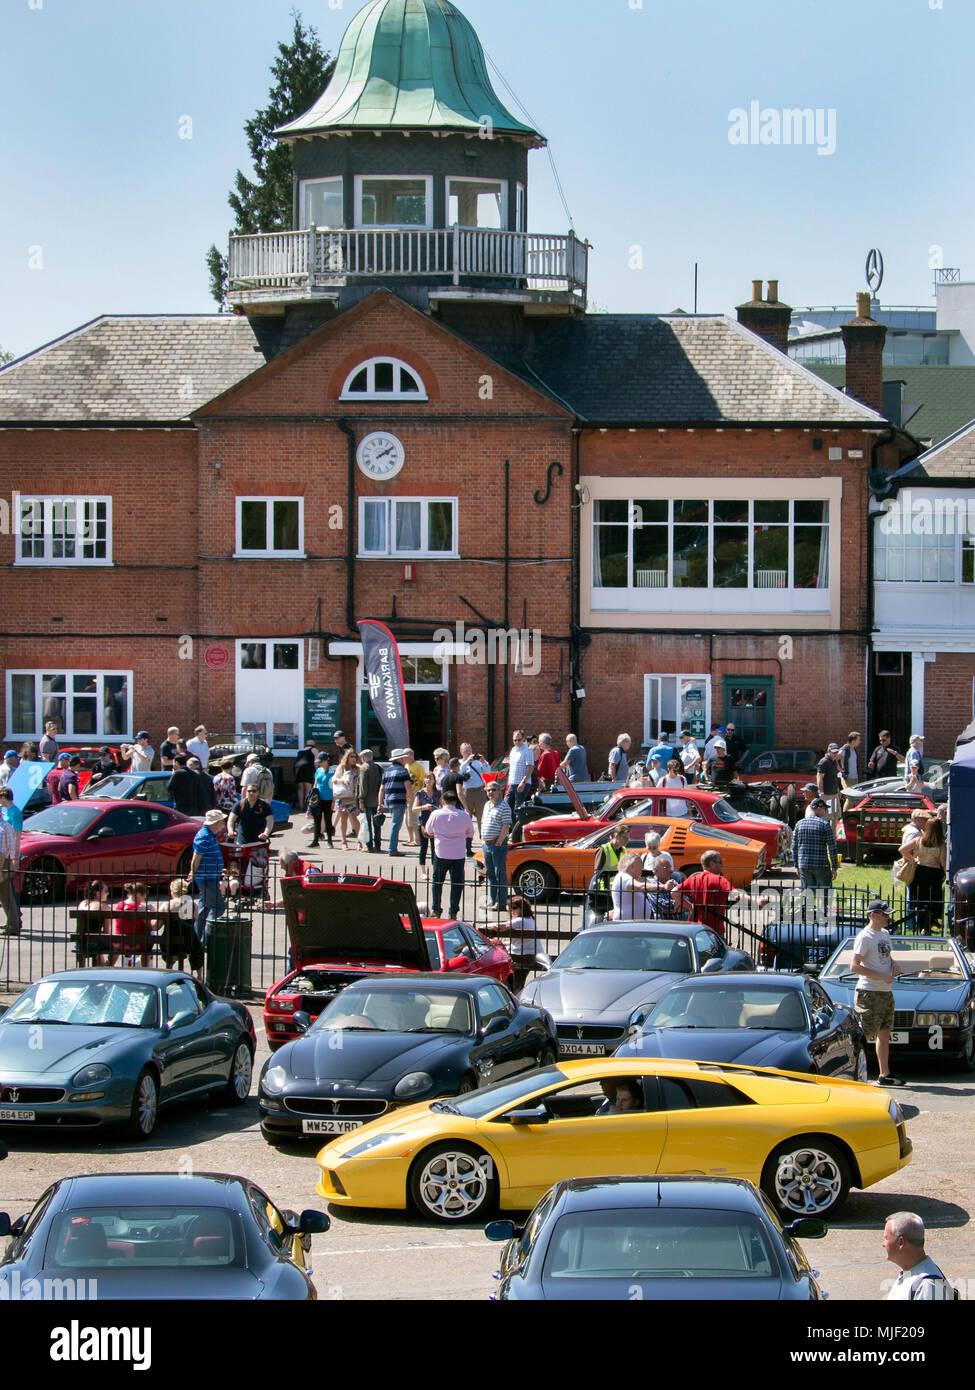 Italian car day at Brooklands Museum in Weybridge Surrey 05/05/2018 - Stock Image